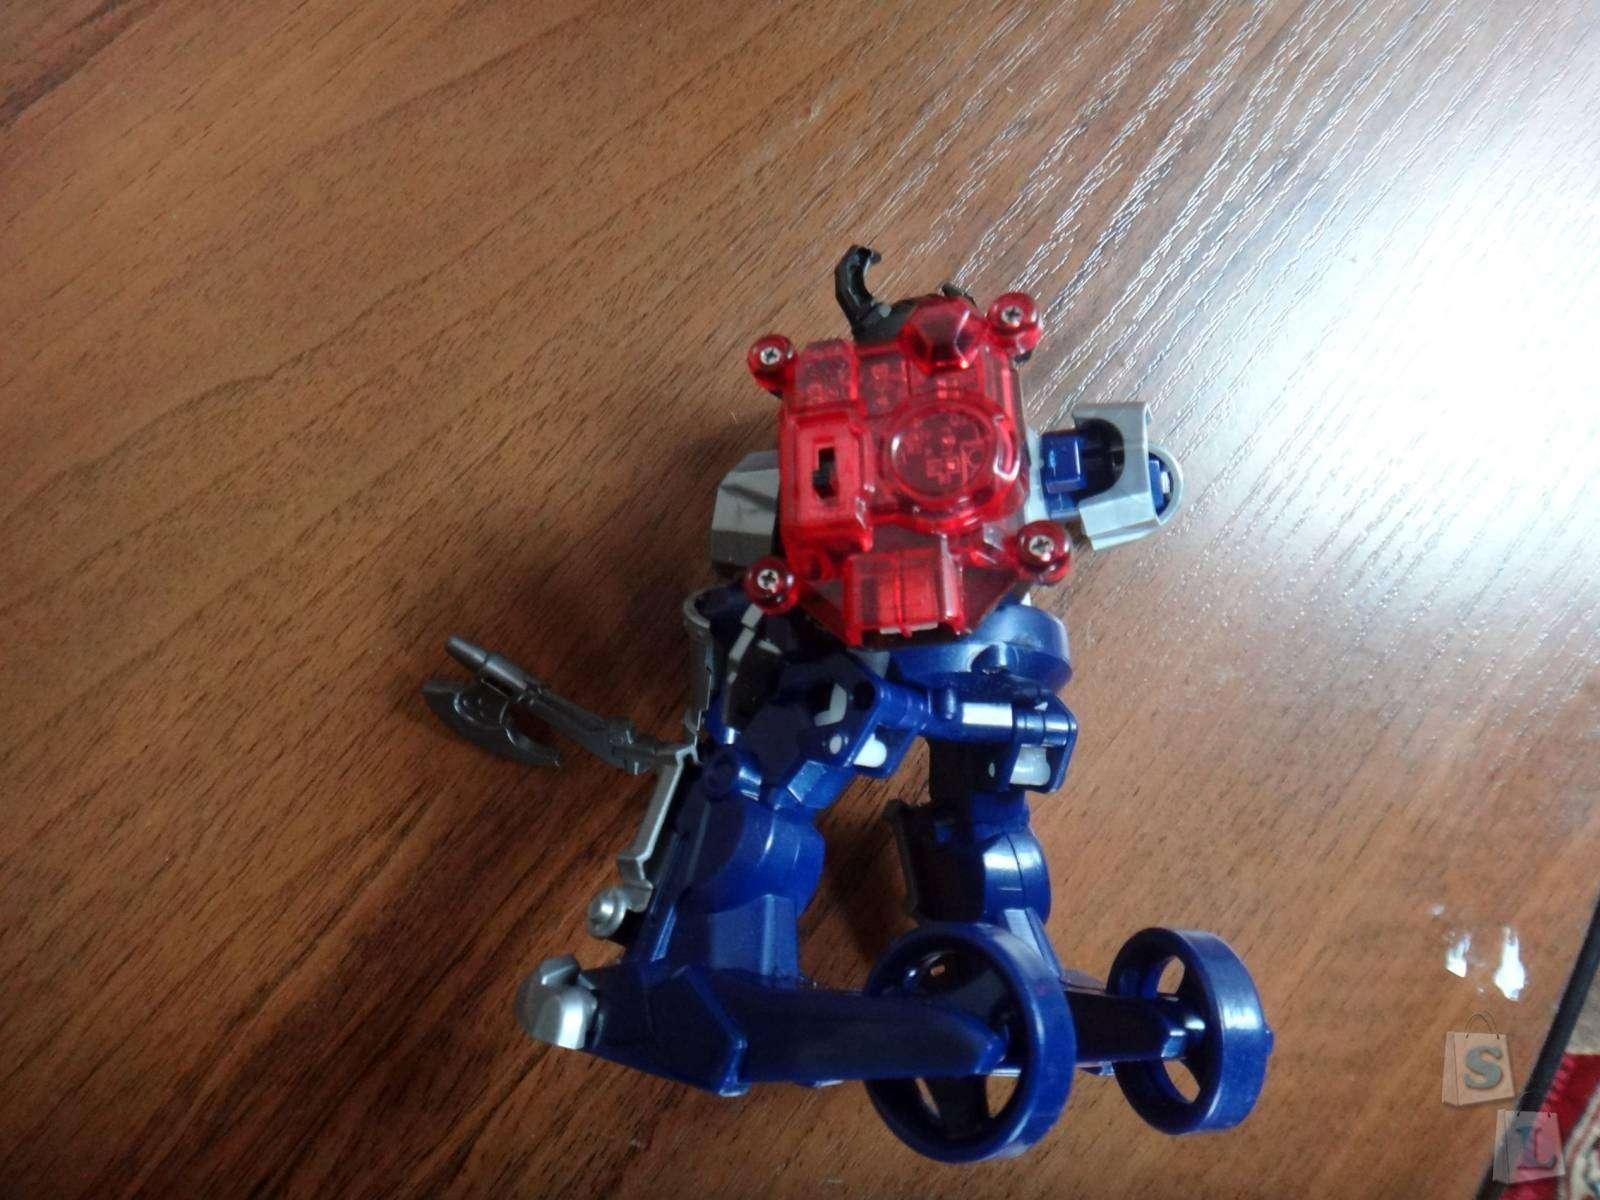 Amazon: Обзор боевые роботы Tomy Battroborg на арене рыцарь и викинг